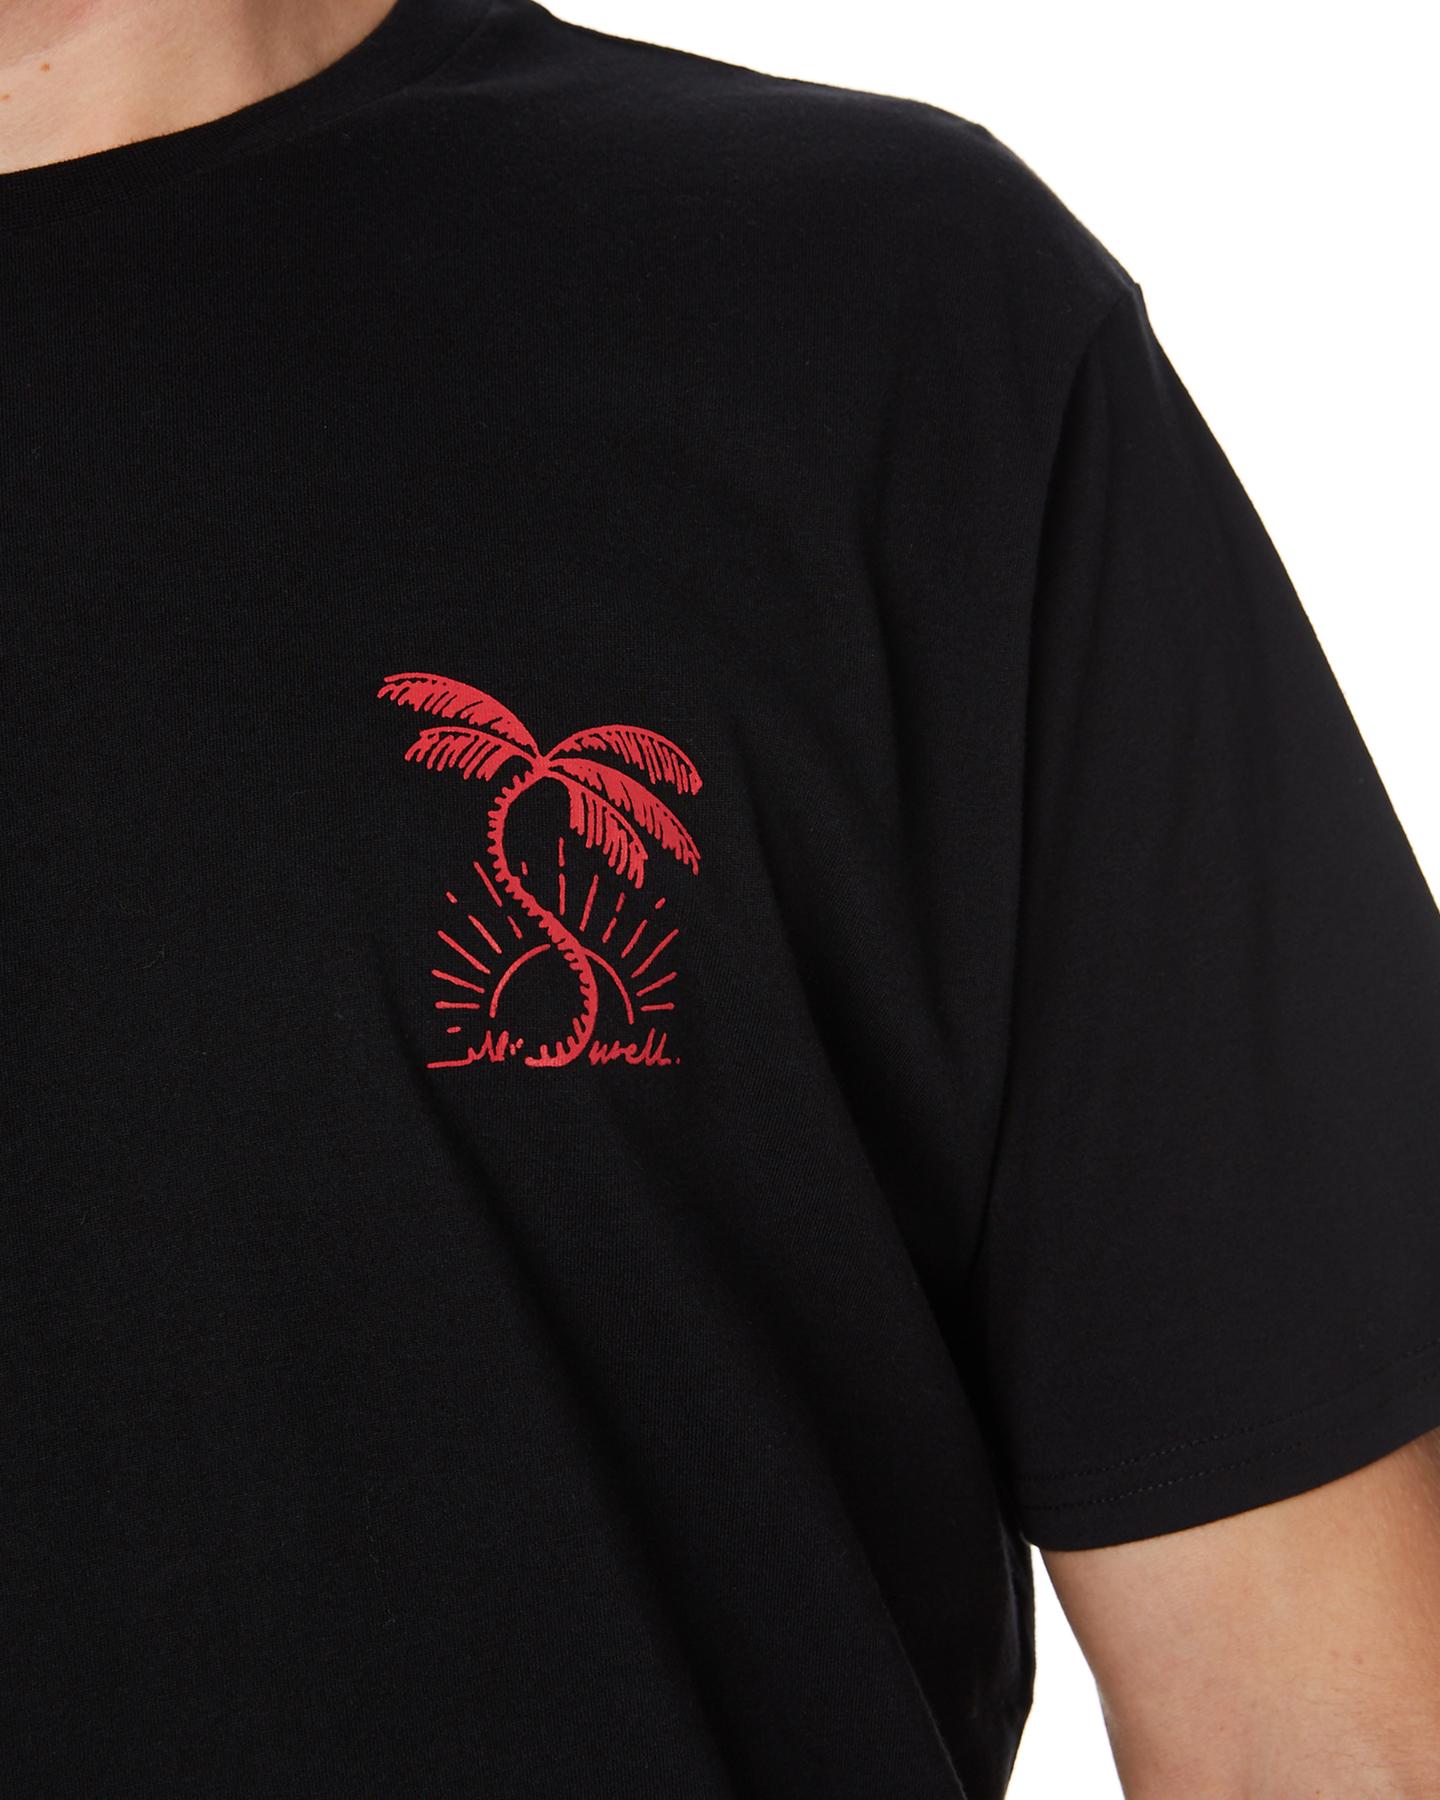 New-Swell-Men-039-s-Paradiso-Mens-Tee-Crew-Neck-Short-Sleeve-Cotton-Soft thumbnail 9